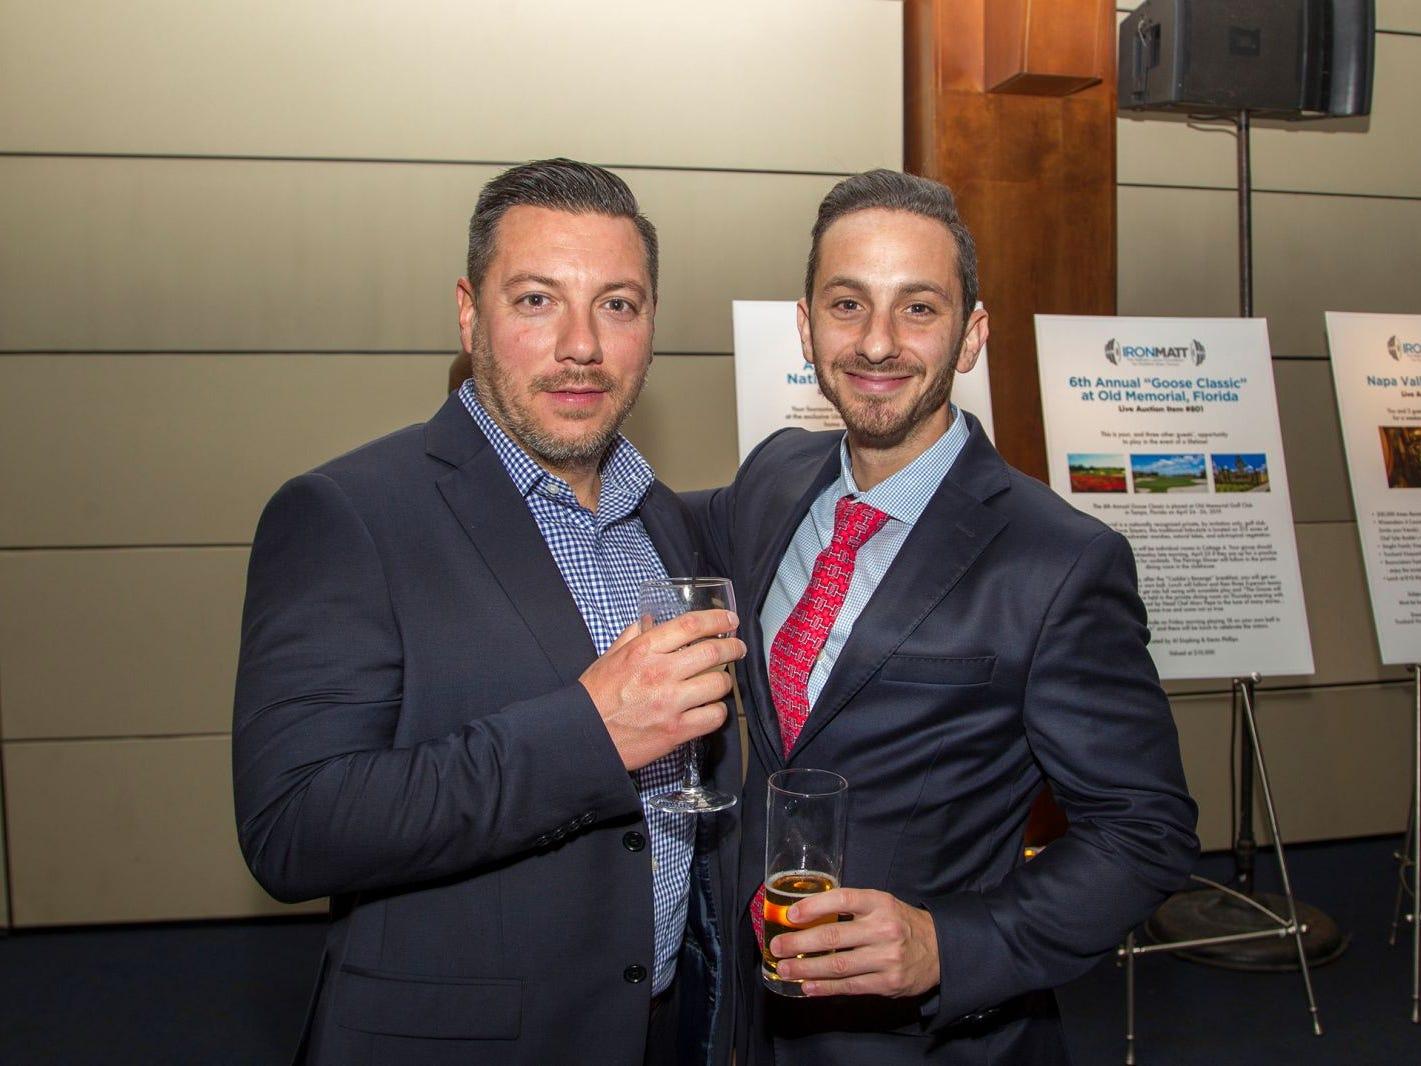 David and Josh. 11th annual IronMatt Fundraiser Gala at Pier 60 Chelsea Piers. 09/20/2018